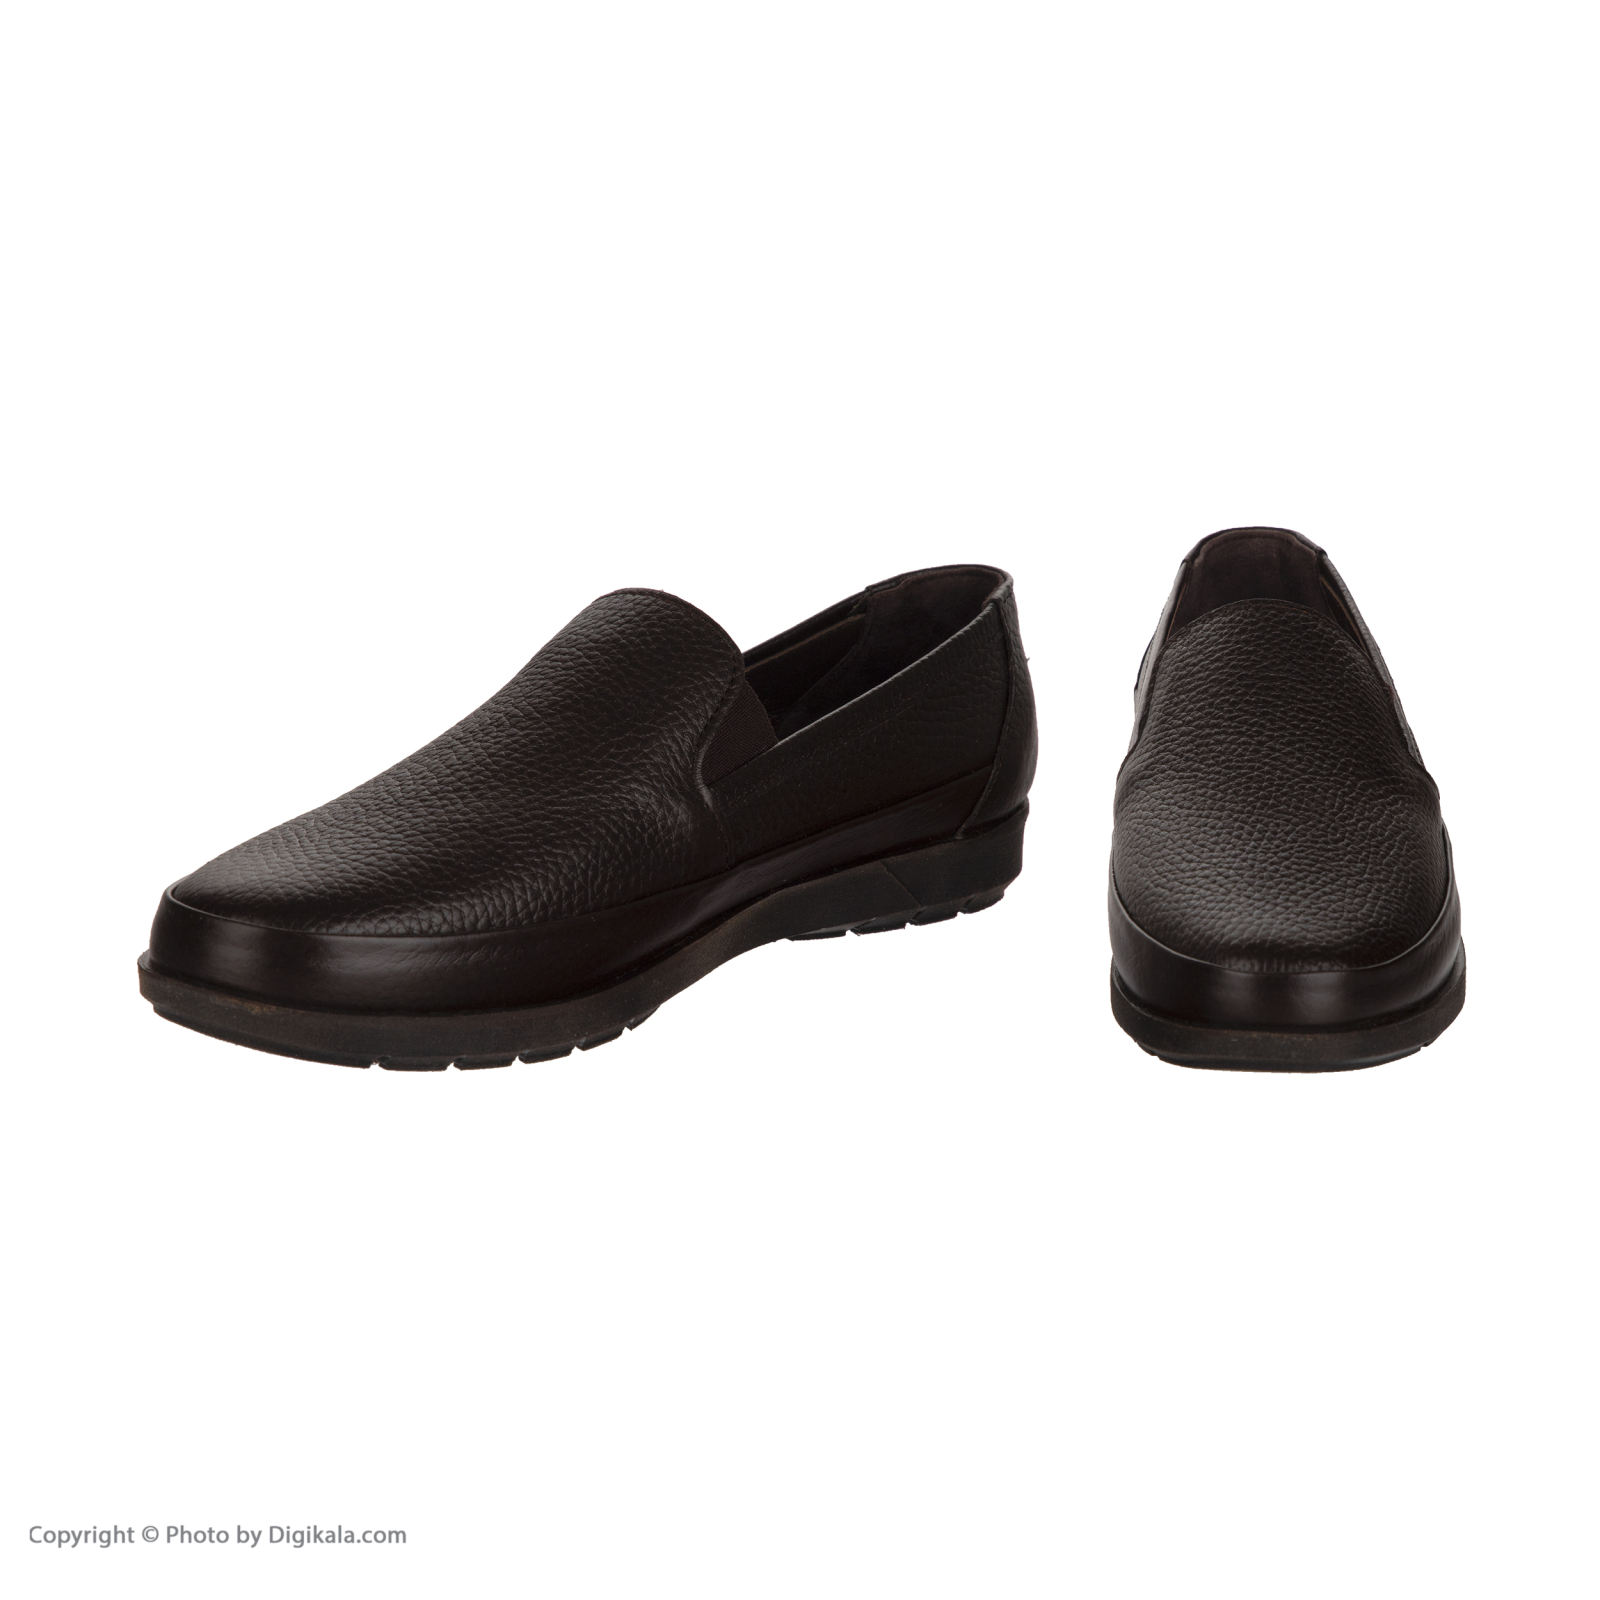 کفش روزمره زنانه سوته مدل 3069A500104 -  - 7